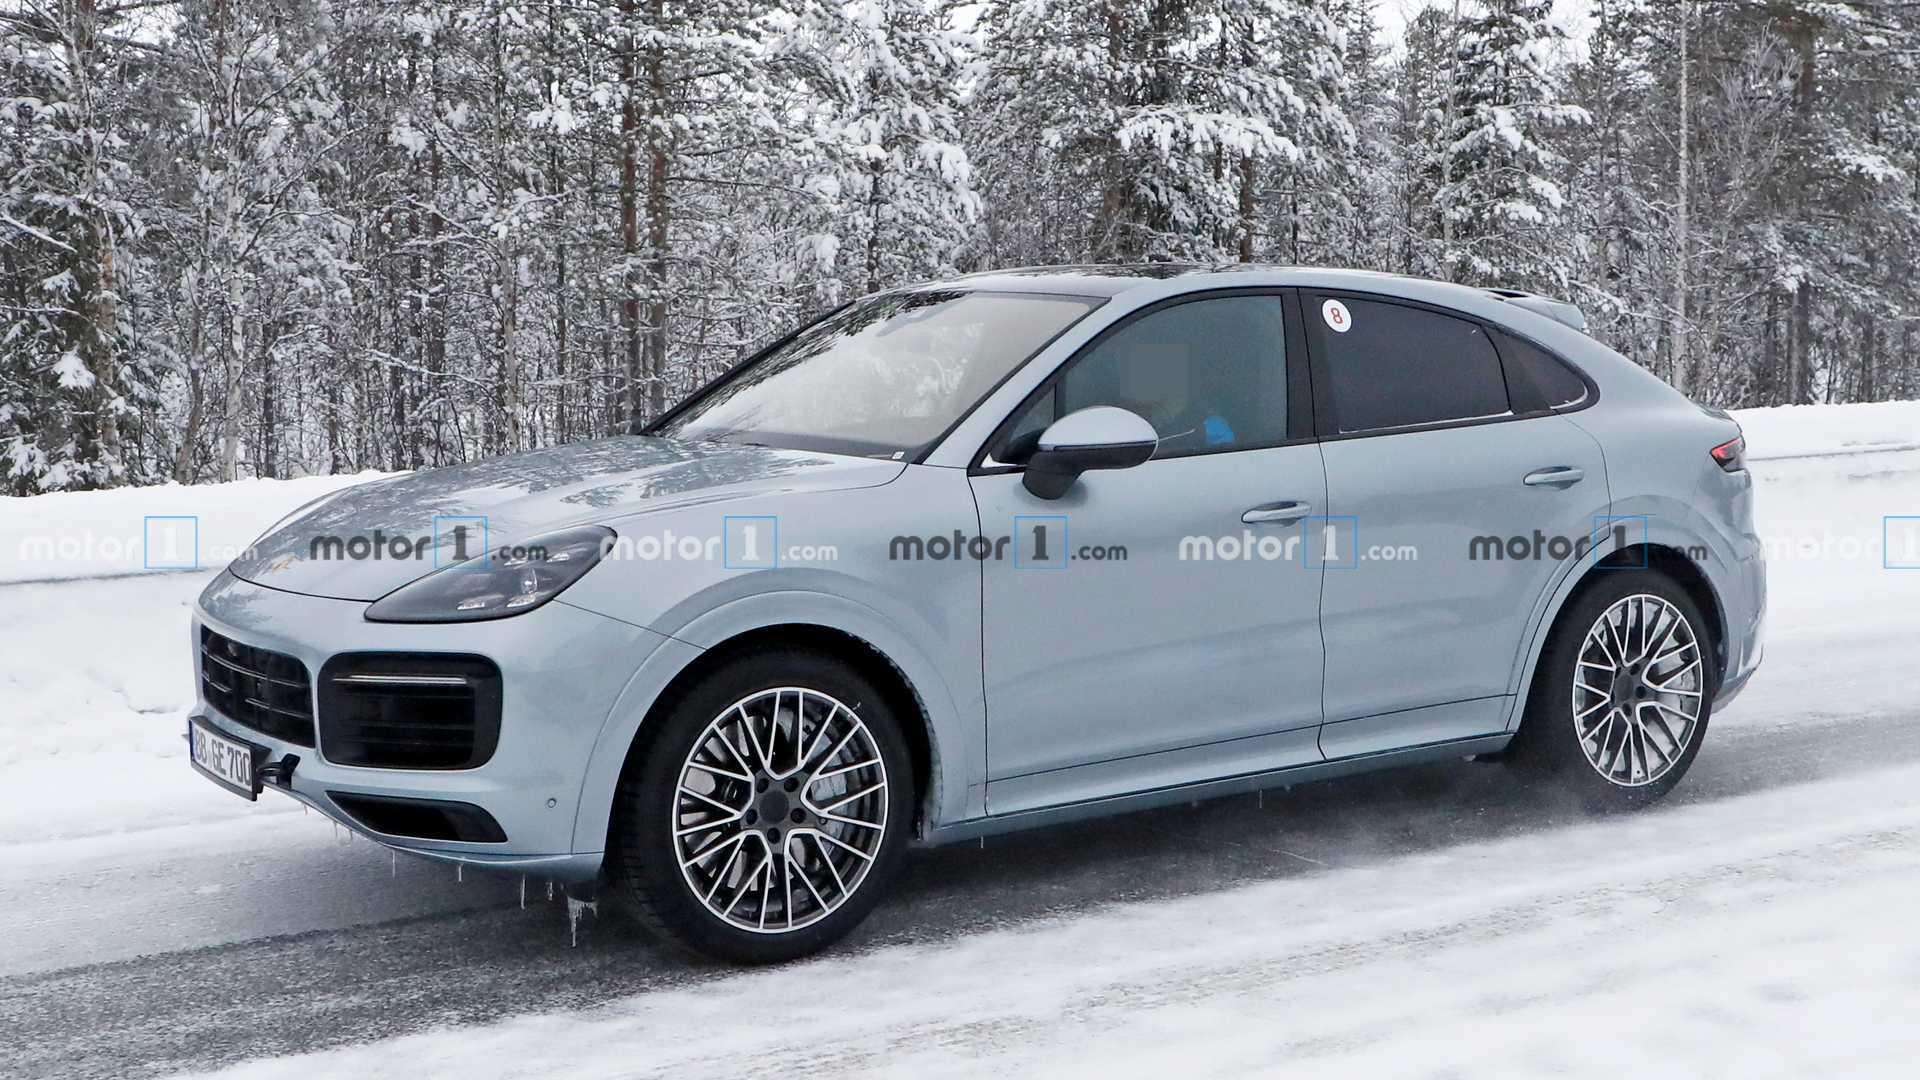 2019 [Porsche] Cayenne coupé - Page 6 Porsche-cayenne-coupe-gt-spy-photos